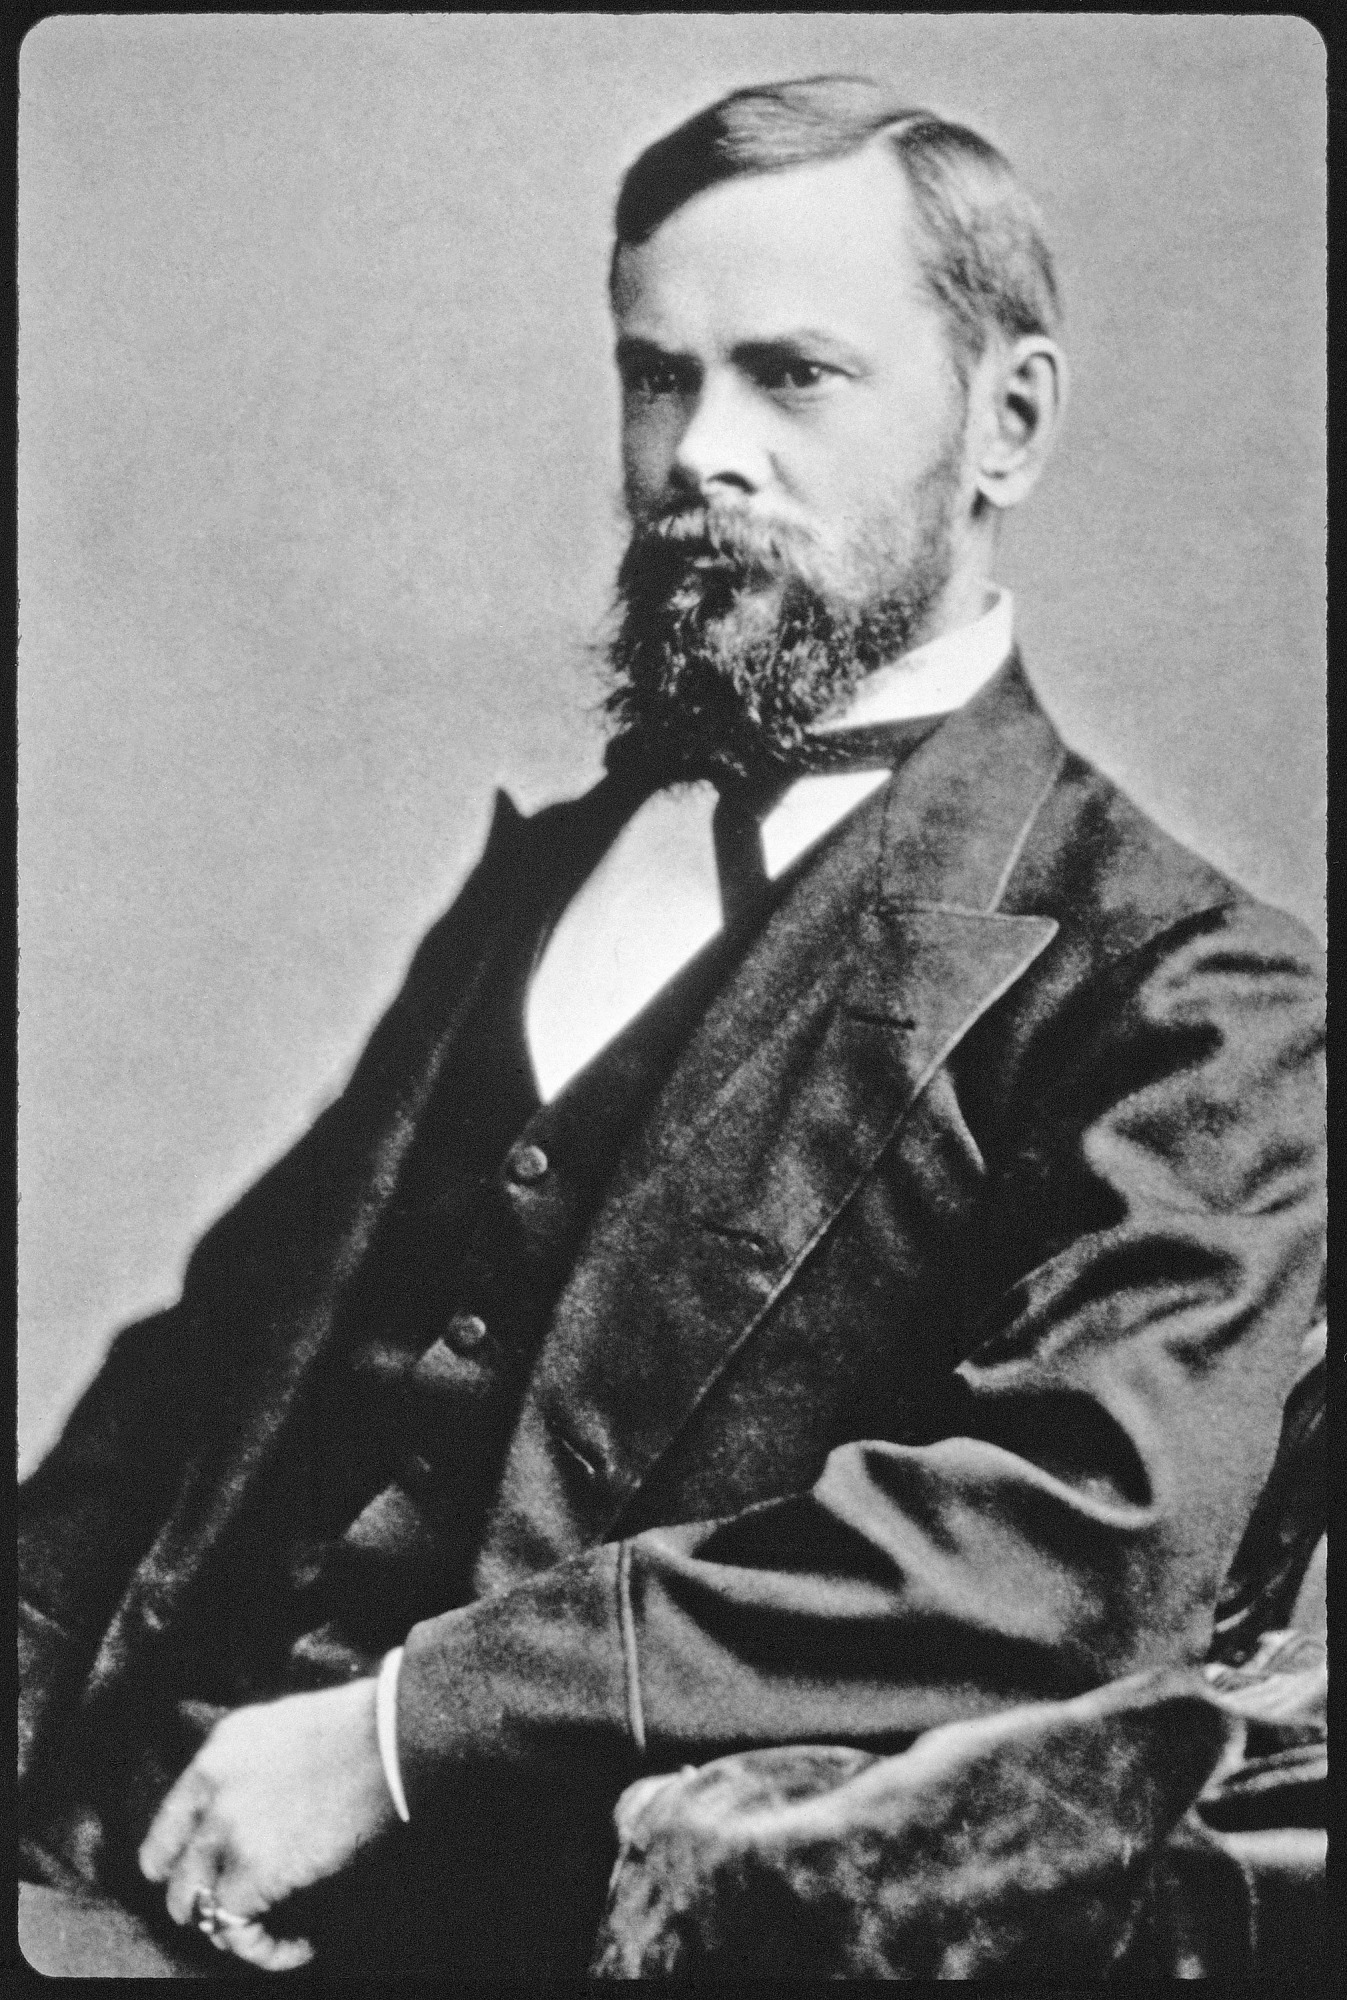 John Henry Comstock, c. 1890s, Smithsonian Archives - History Div, 90-4106.